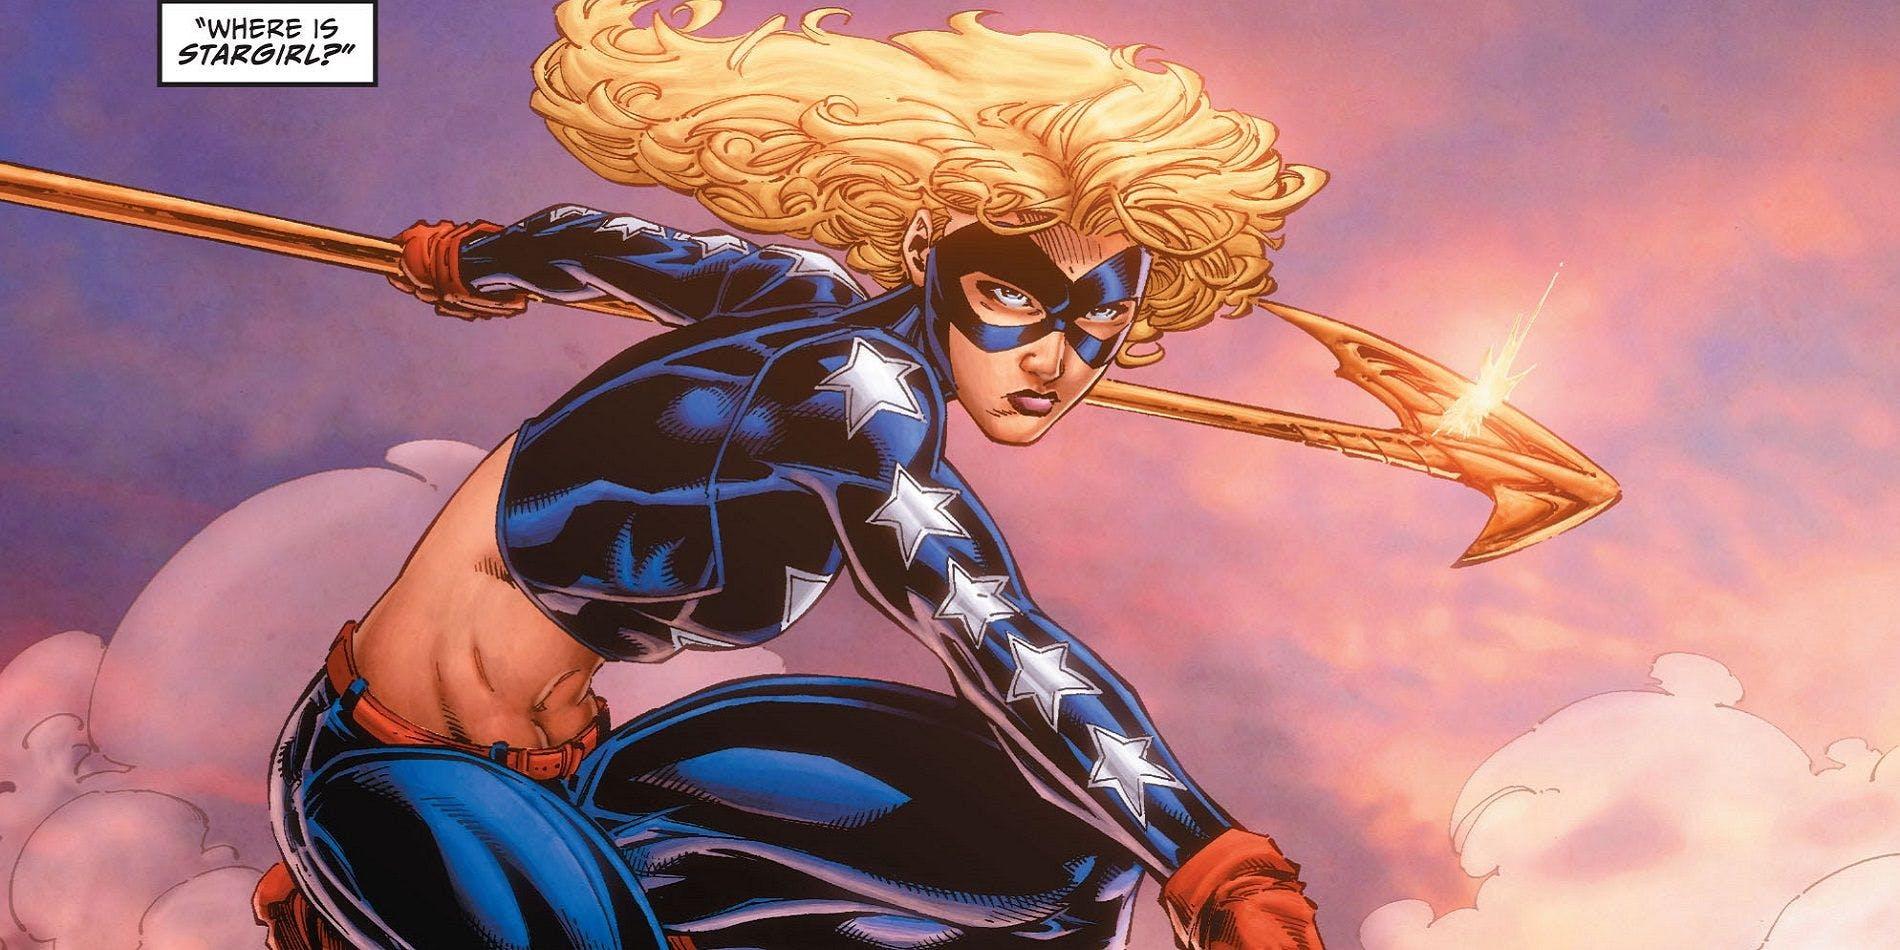 Courtney-Whitmore-as-Stargirl-in-DC-Comics.jpg